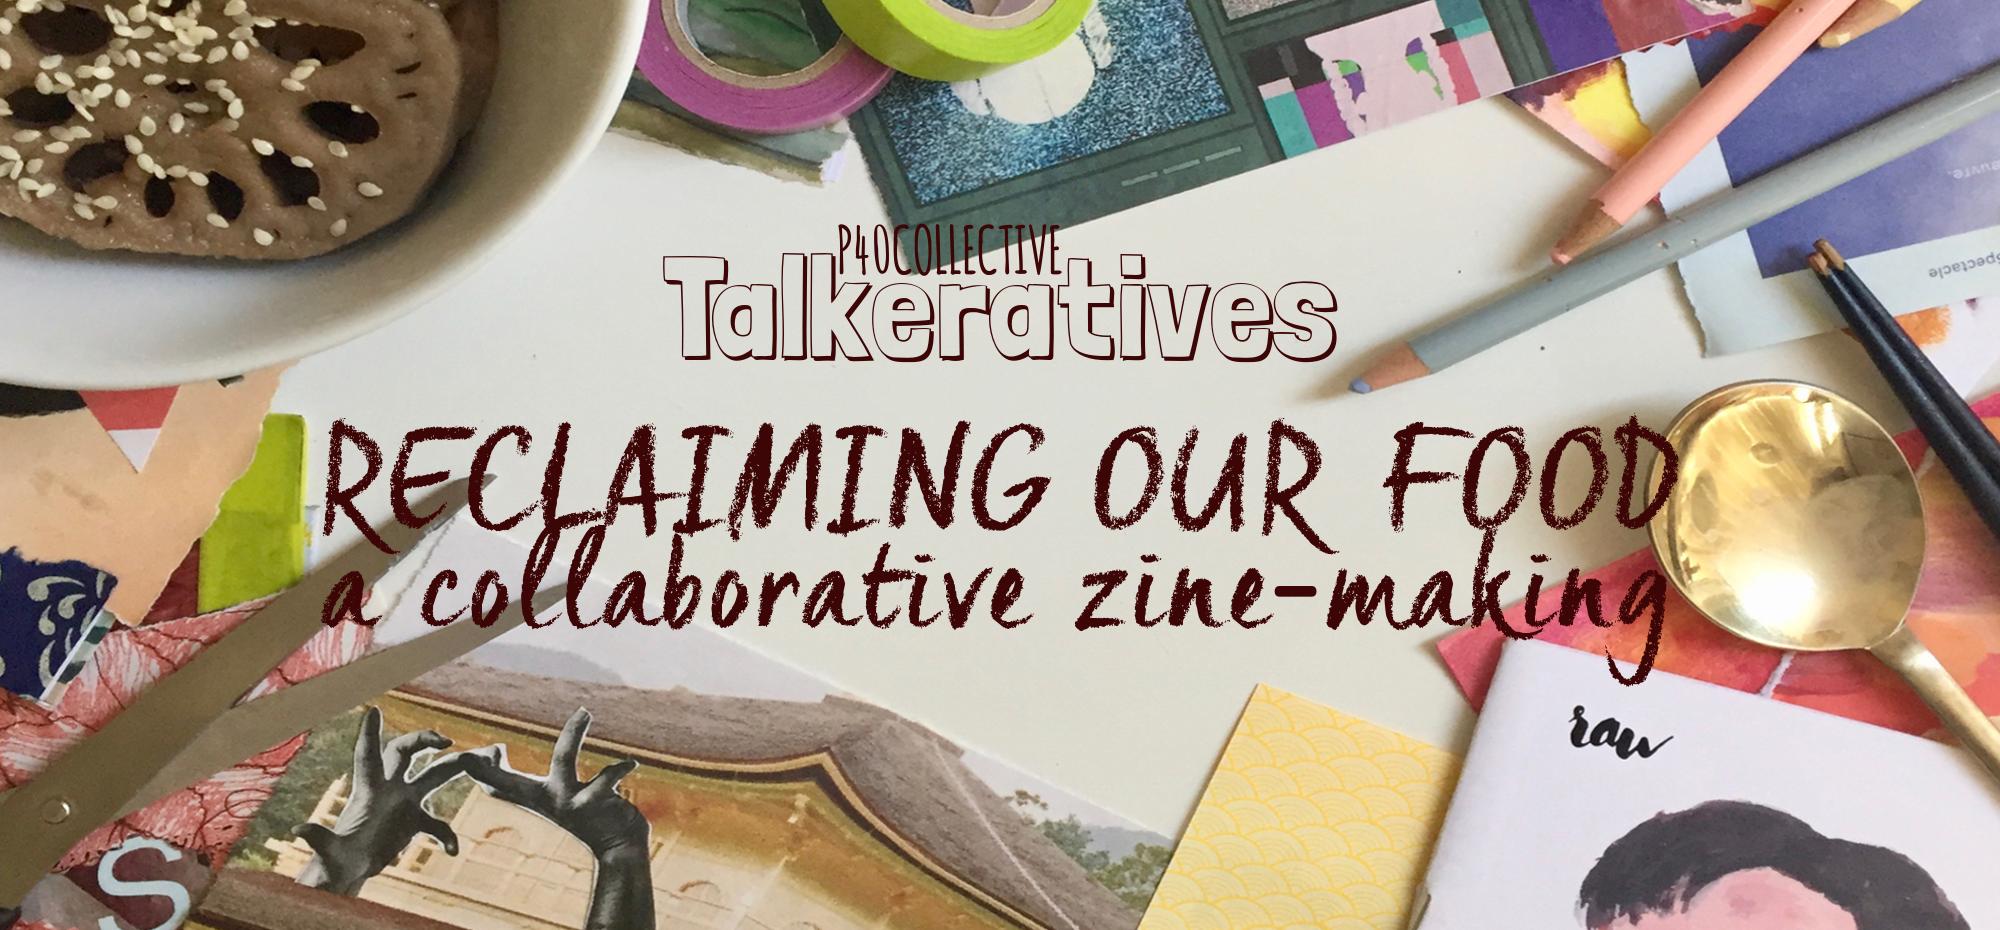 zine-making-talkeratives03.png